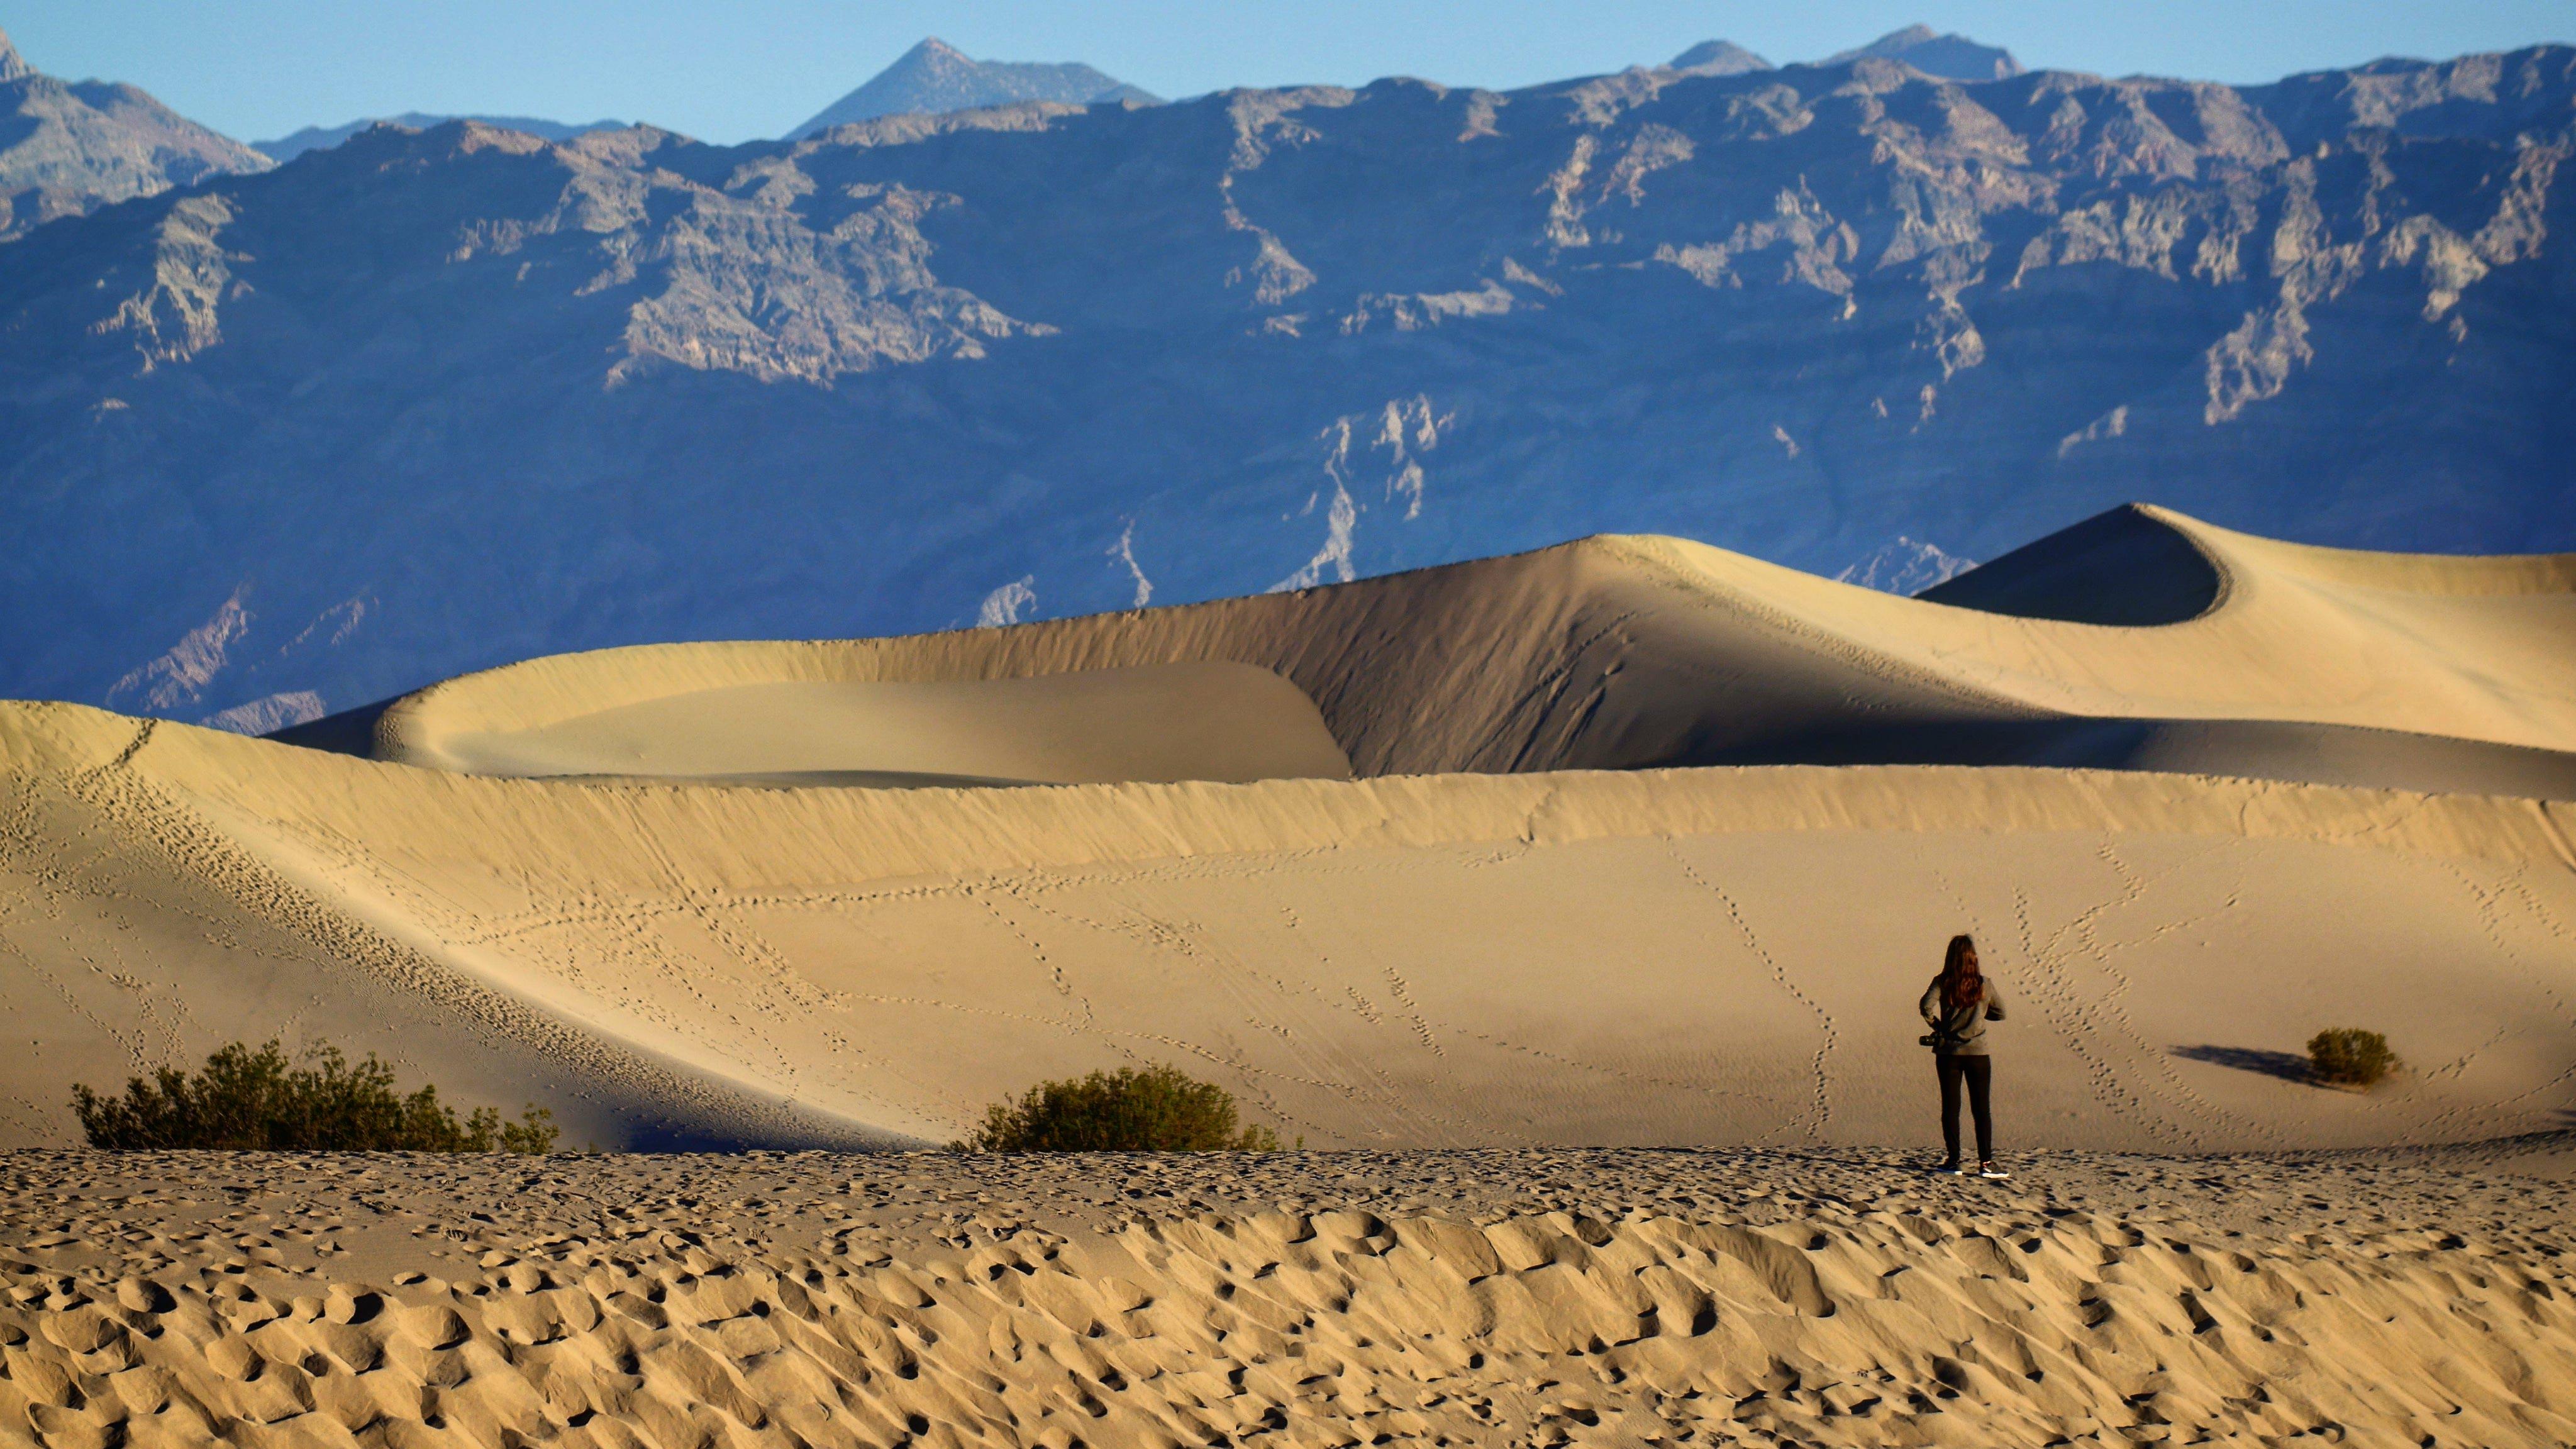 Mesquite Dunes of Death Valley